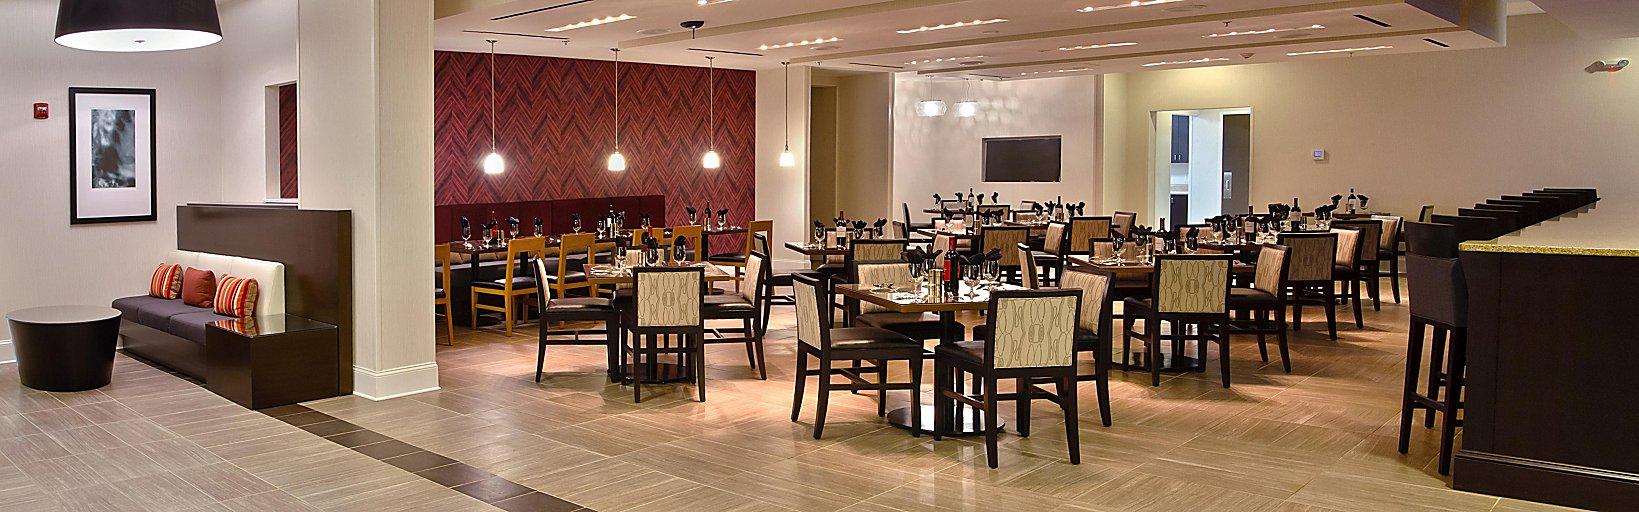 Restaurants Near Holiday Inn Charlotte Airport Conf Ctr